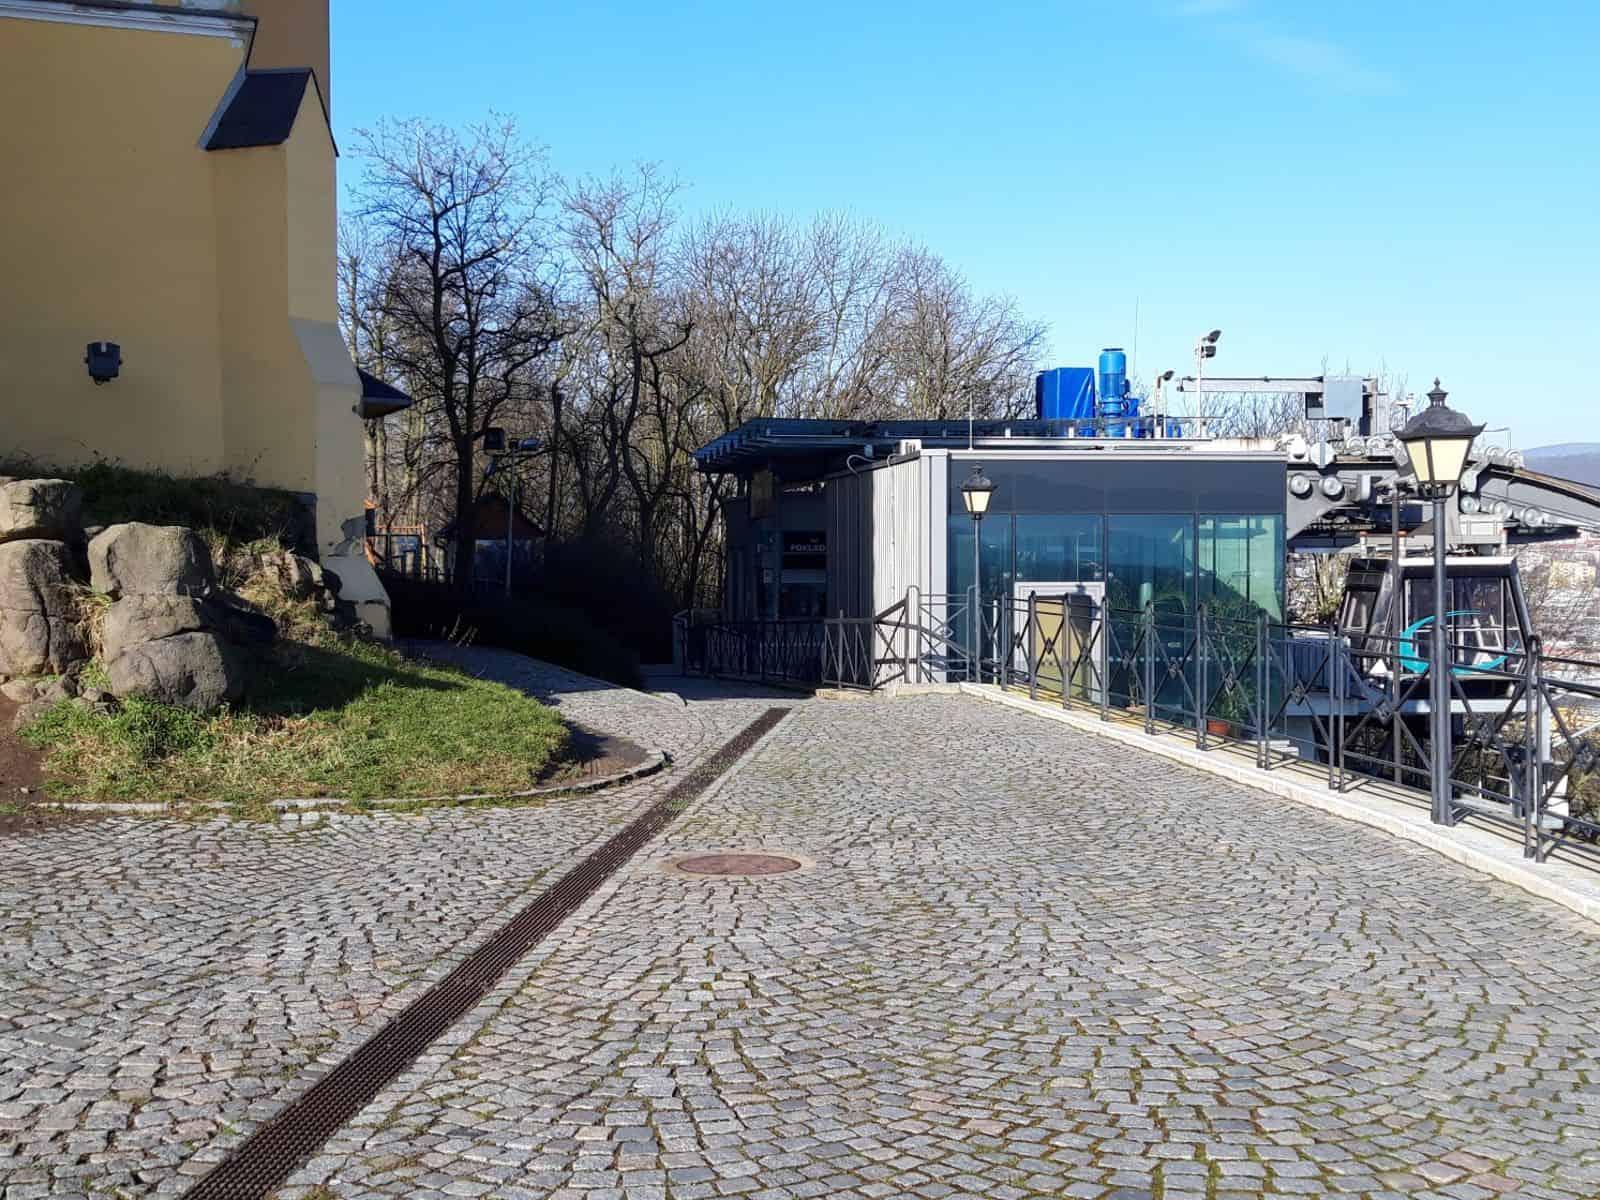 Žlaby Multiline - Větruše, Ústí n.L.